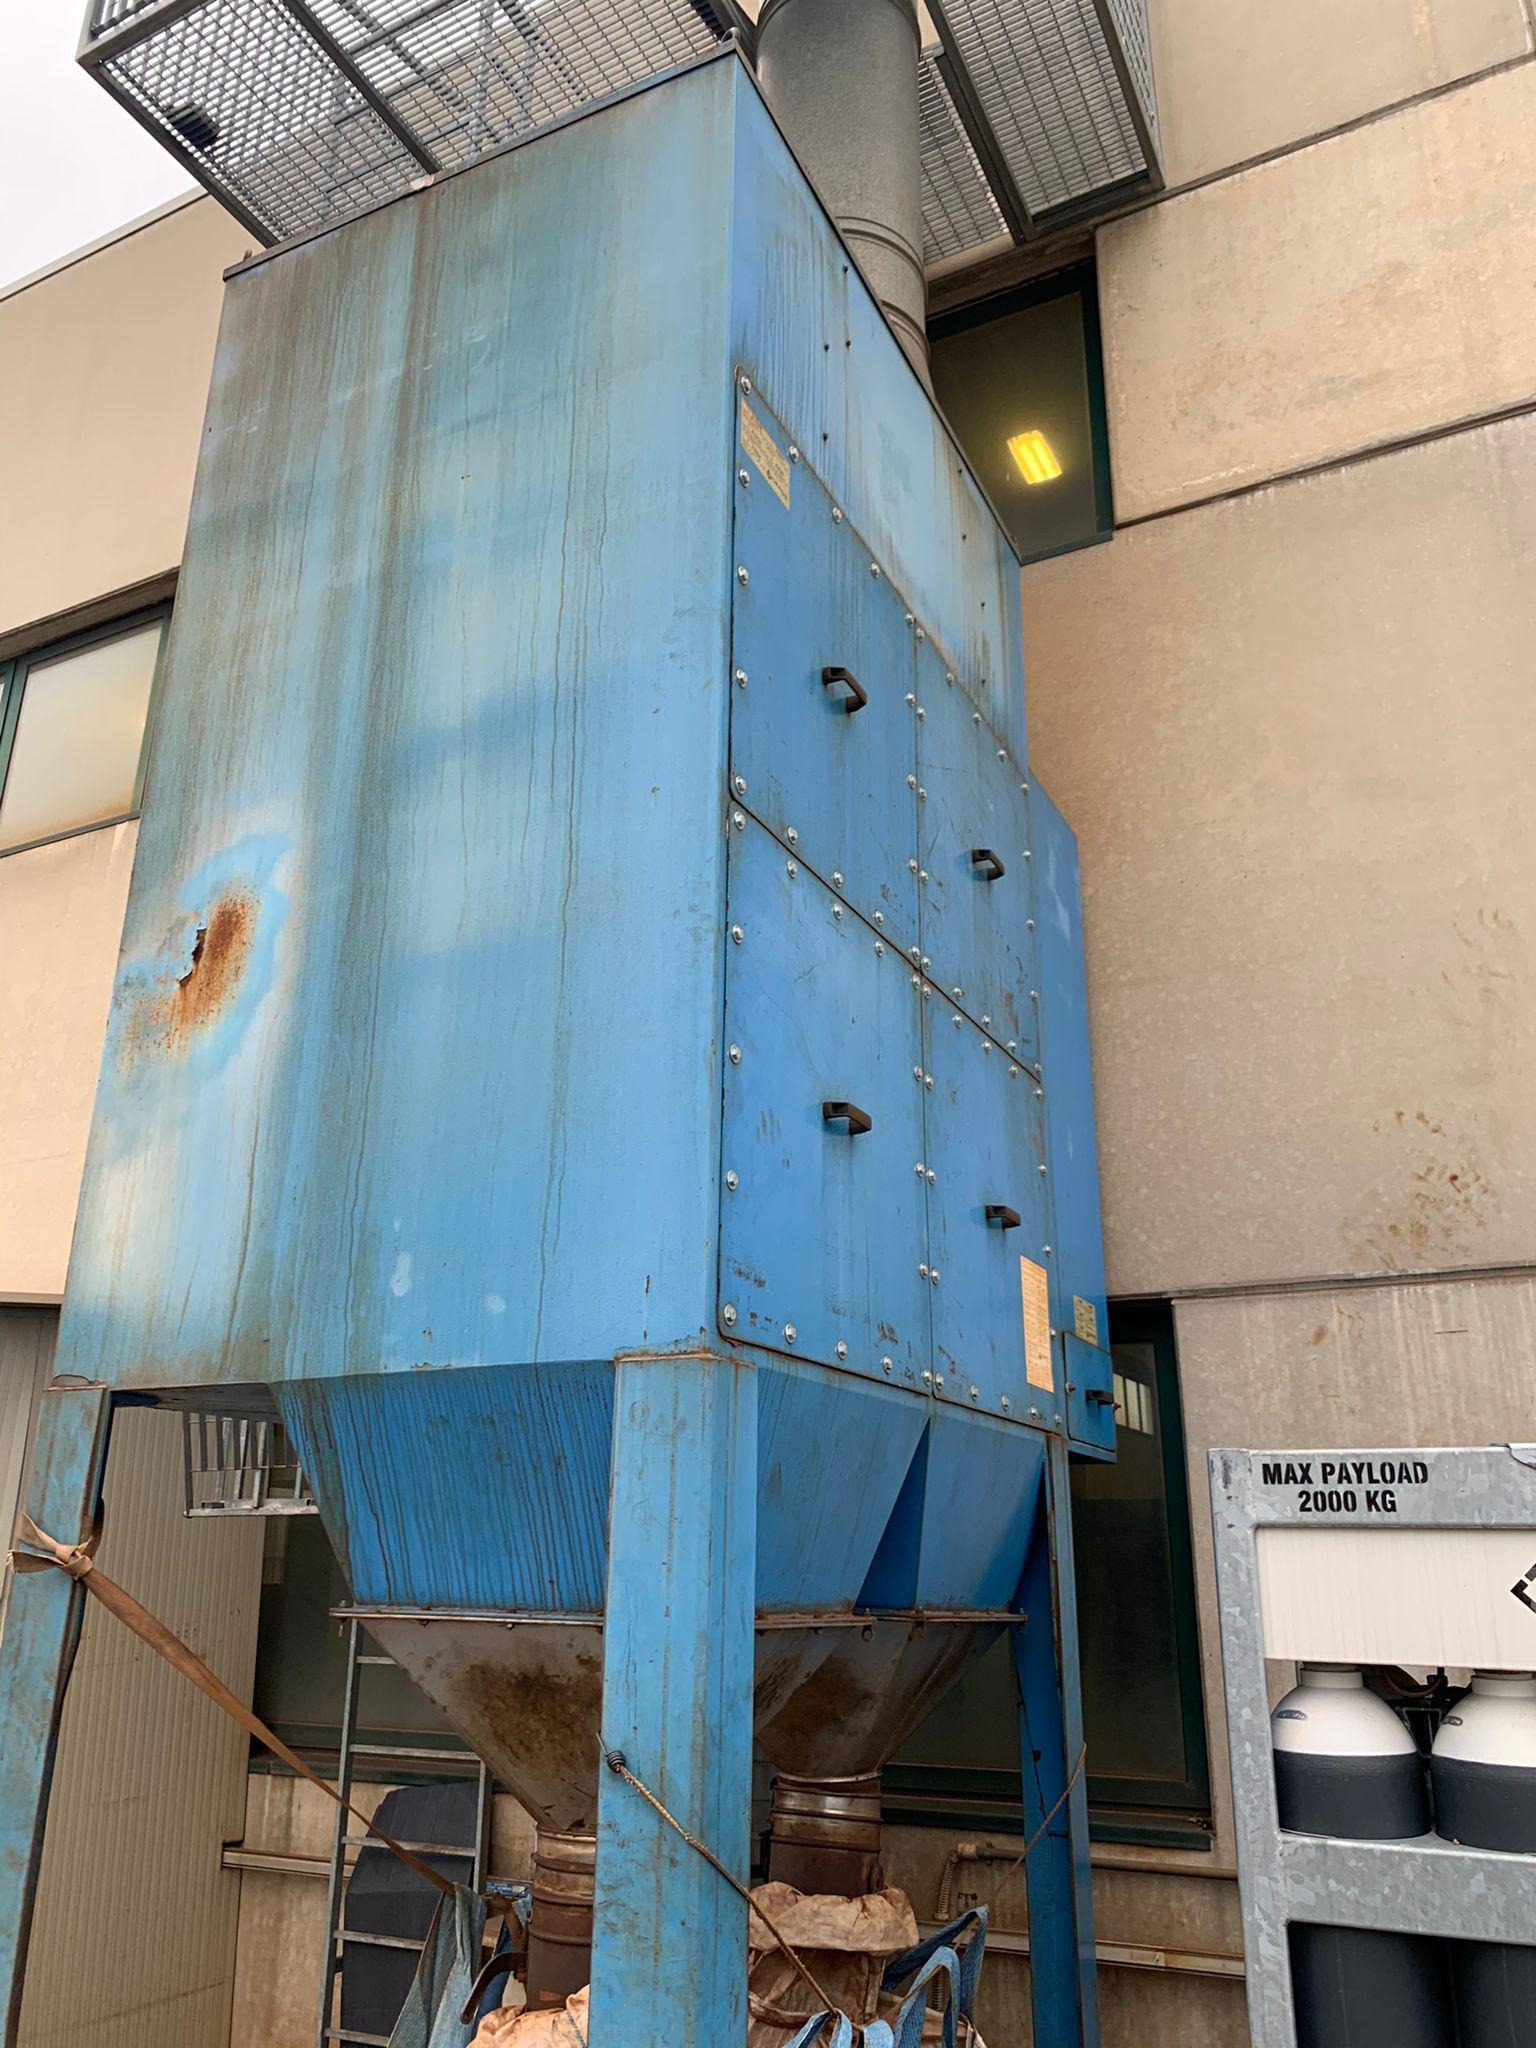 Taglio plasma CMR 12000 x 2500 mm 260 amp in vendita - foto 2